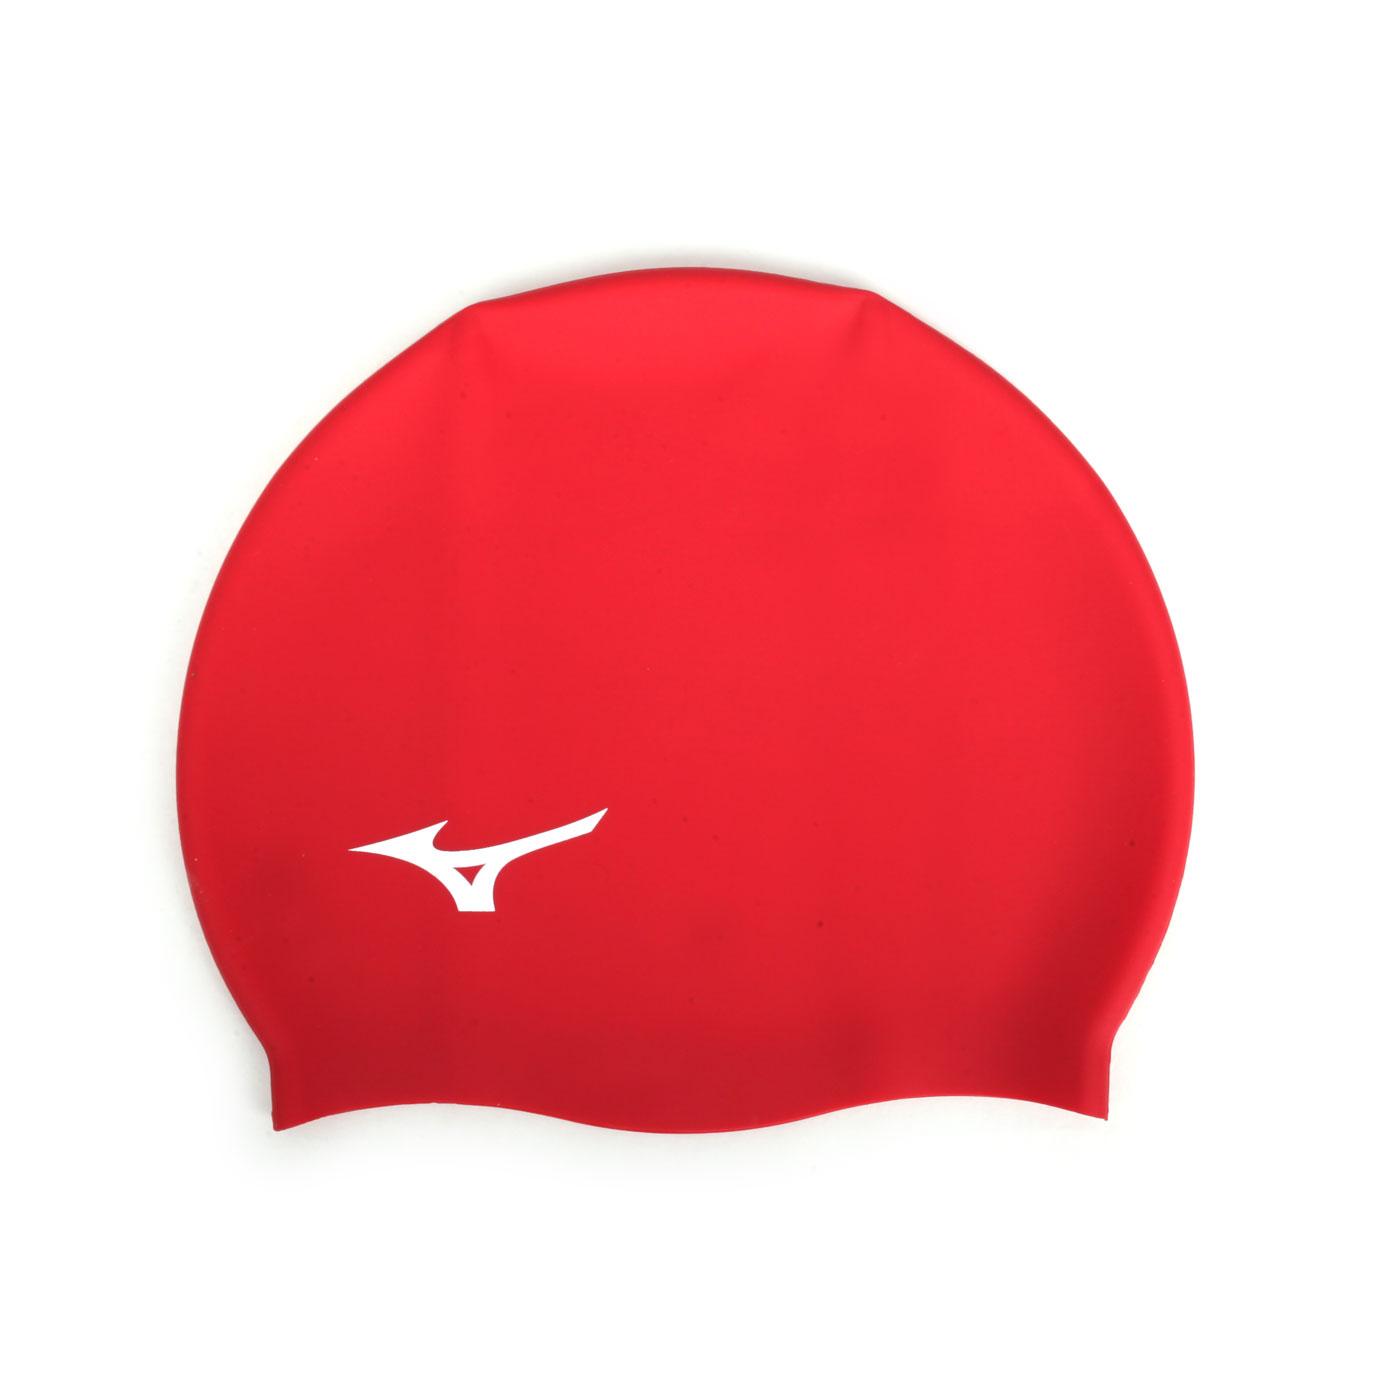 MIZUNO 矽膠泳帽  SWIMN2JW914000-01 - 紅白